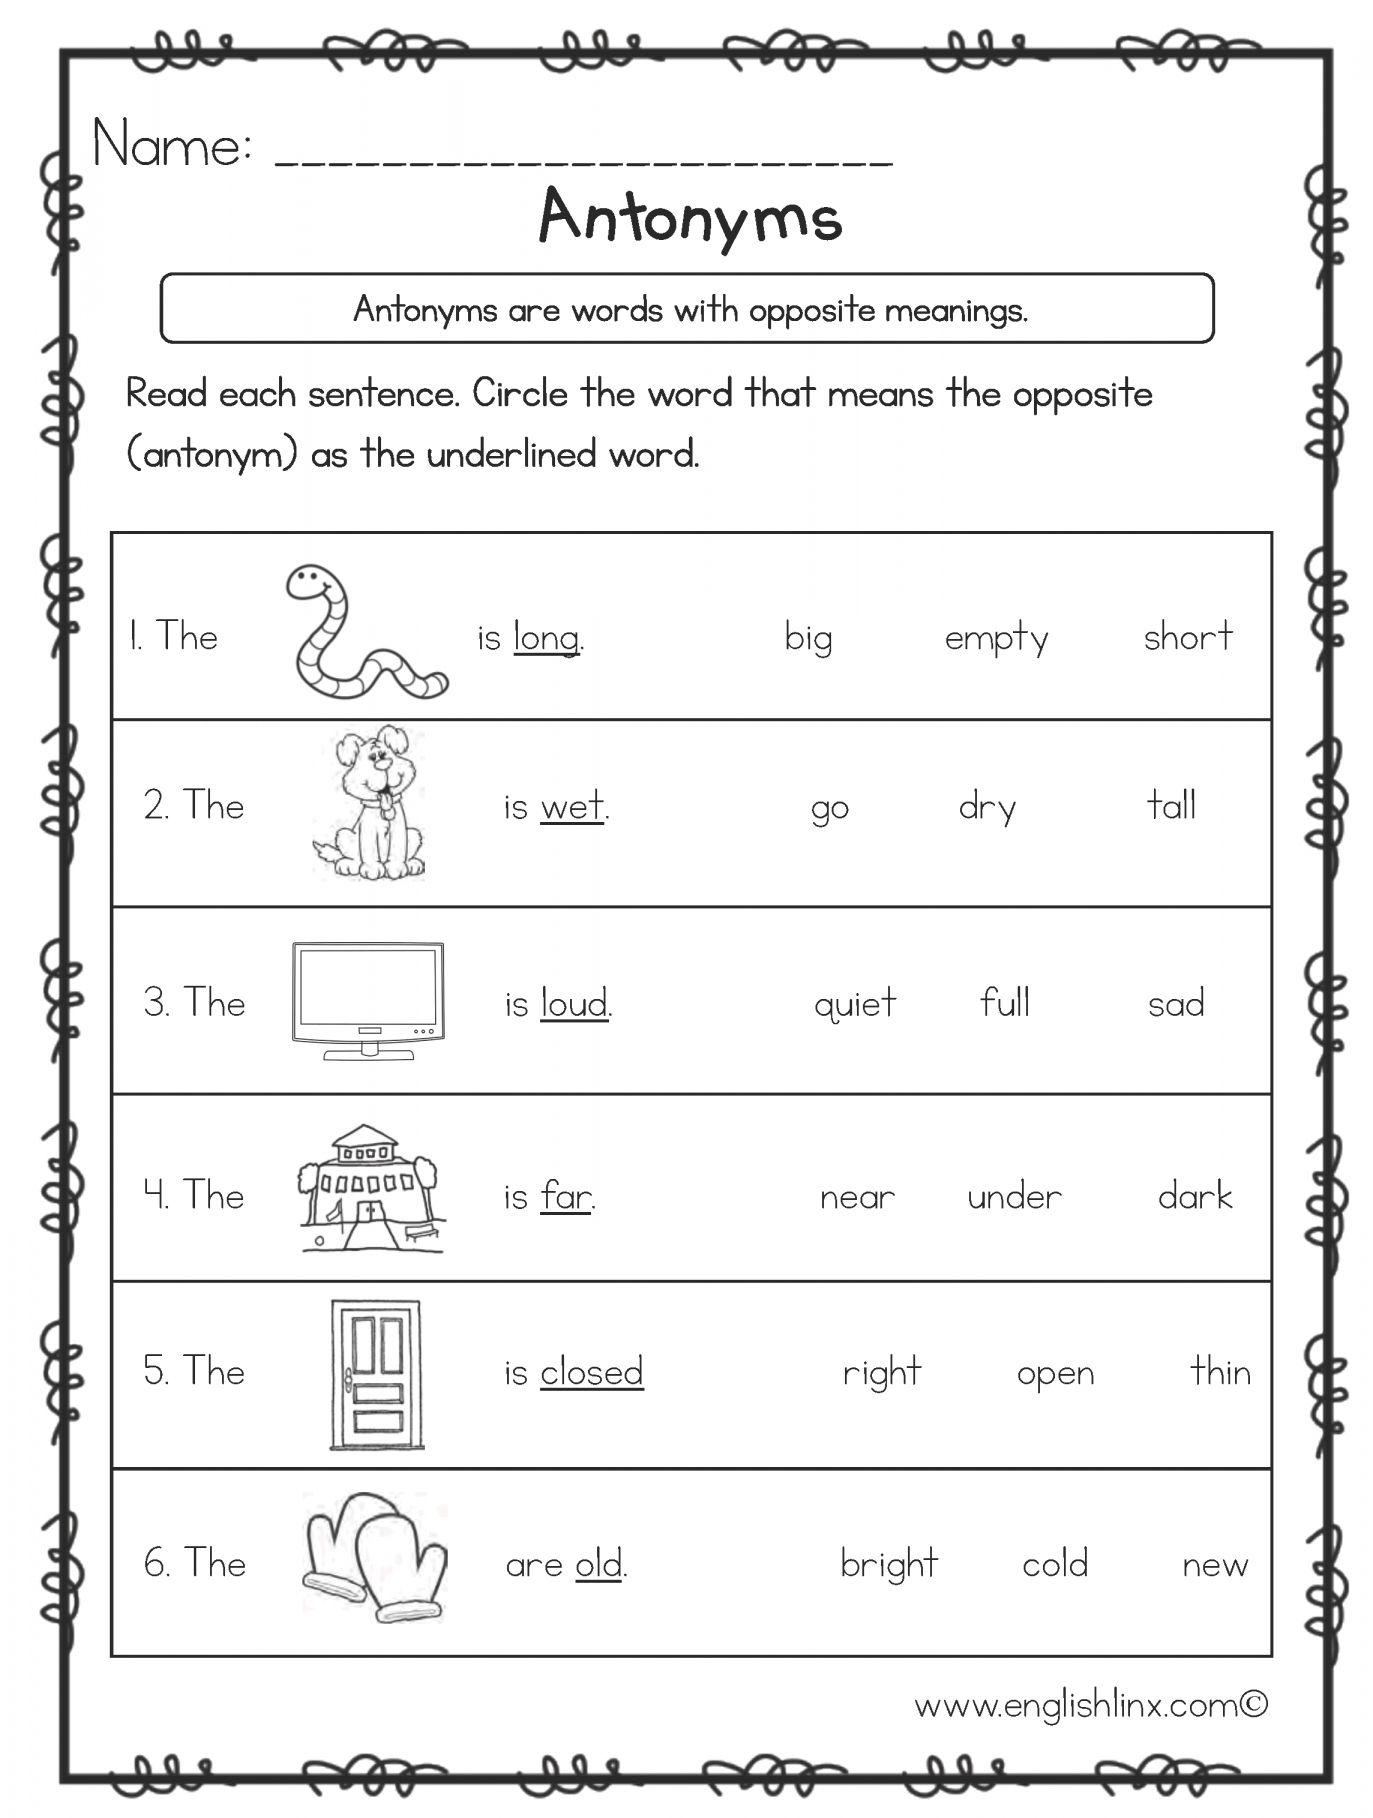 9 Antonyms Worksheets 3rd Grade